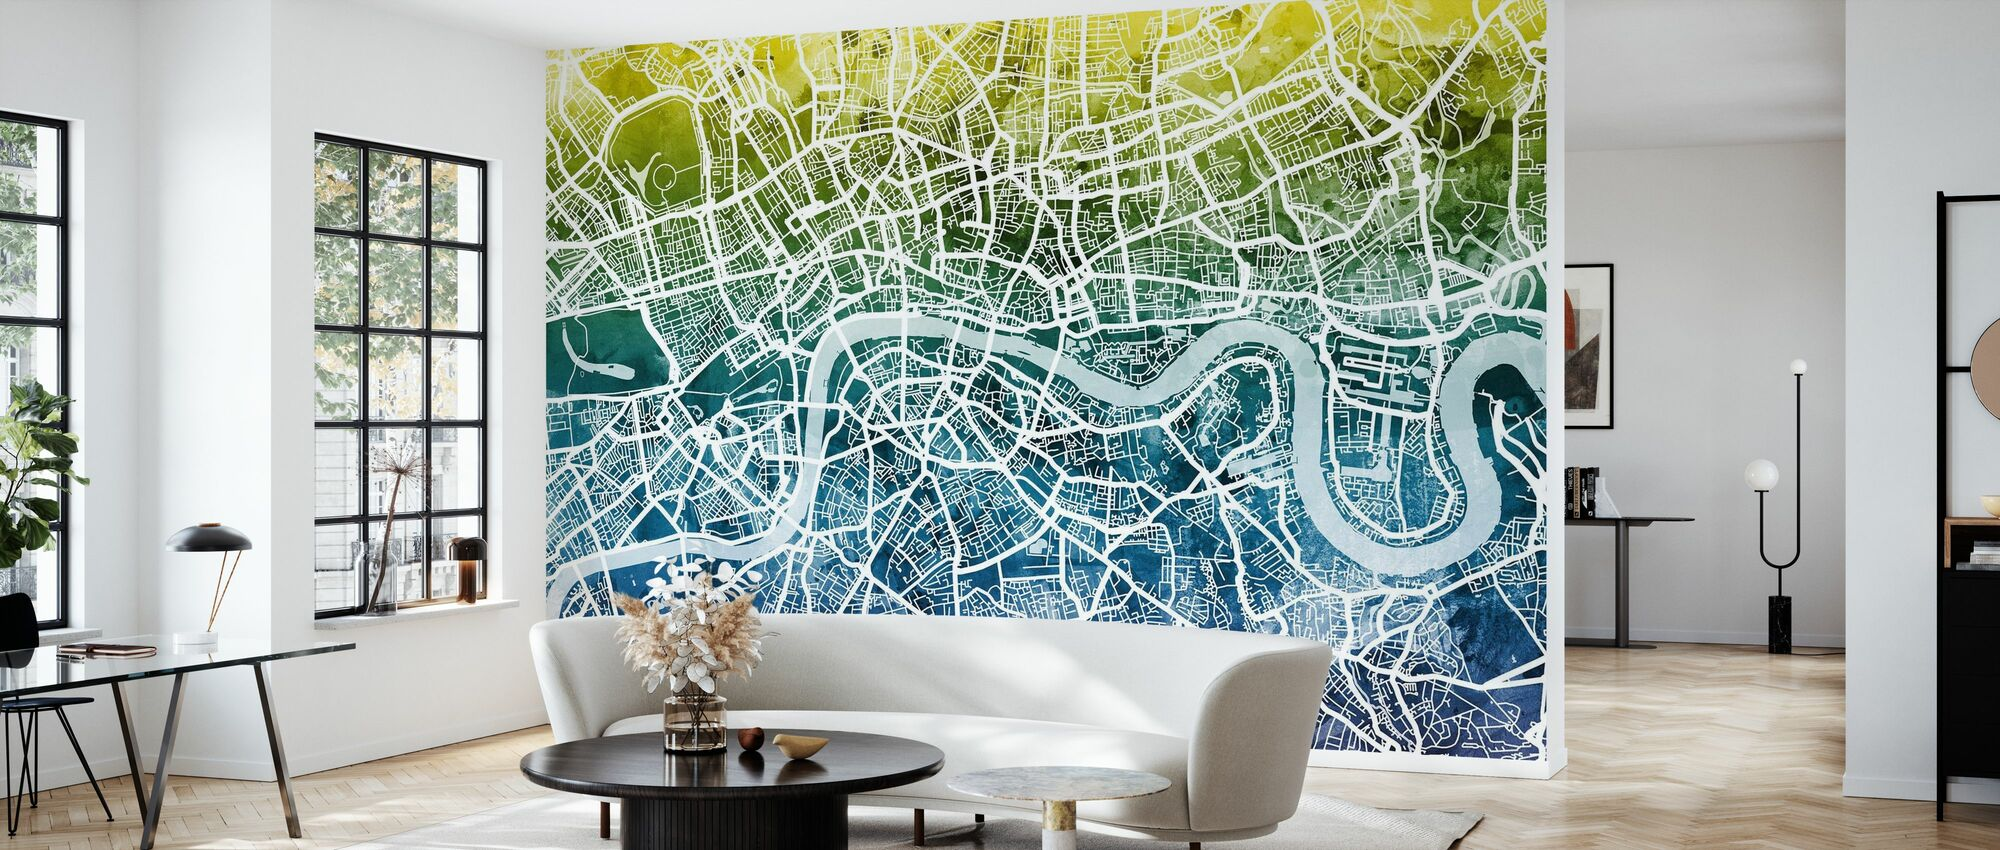 Lontoo Street Kartta Bluegreen - Tapetti - Olohuone